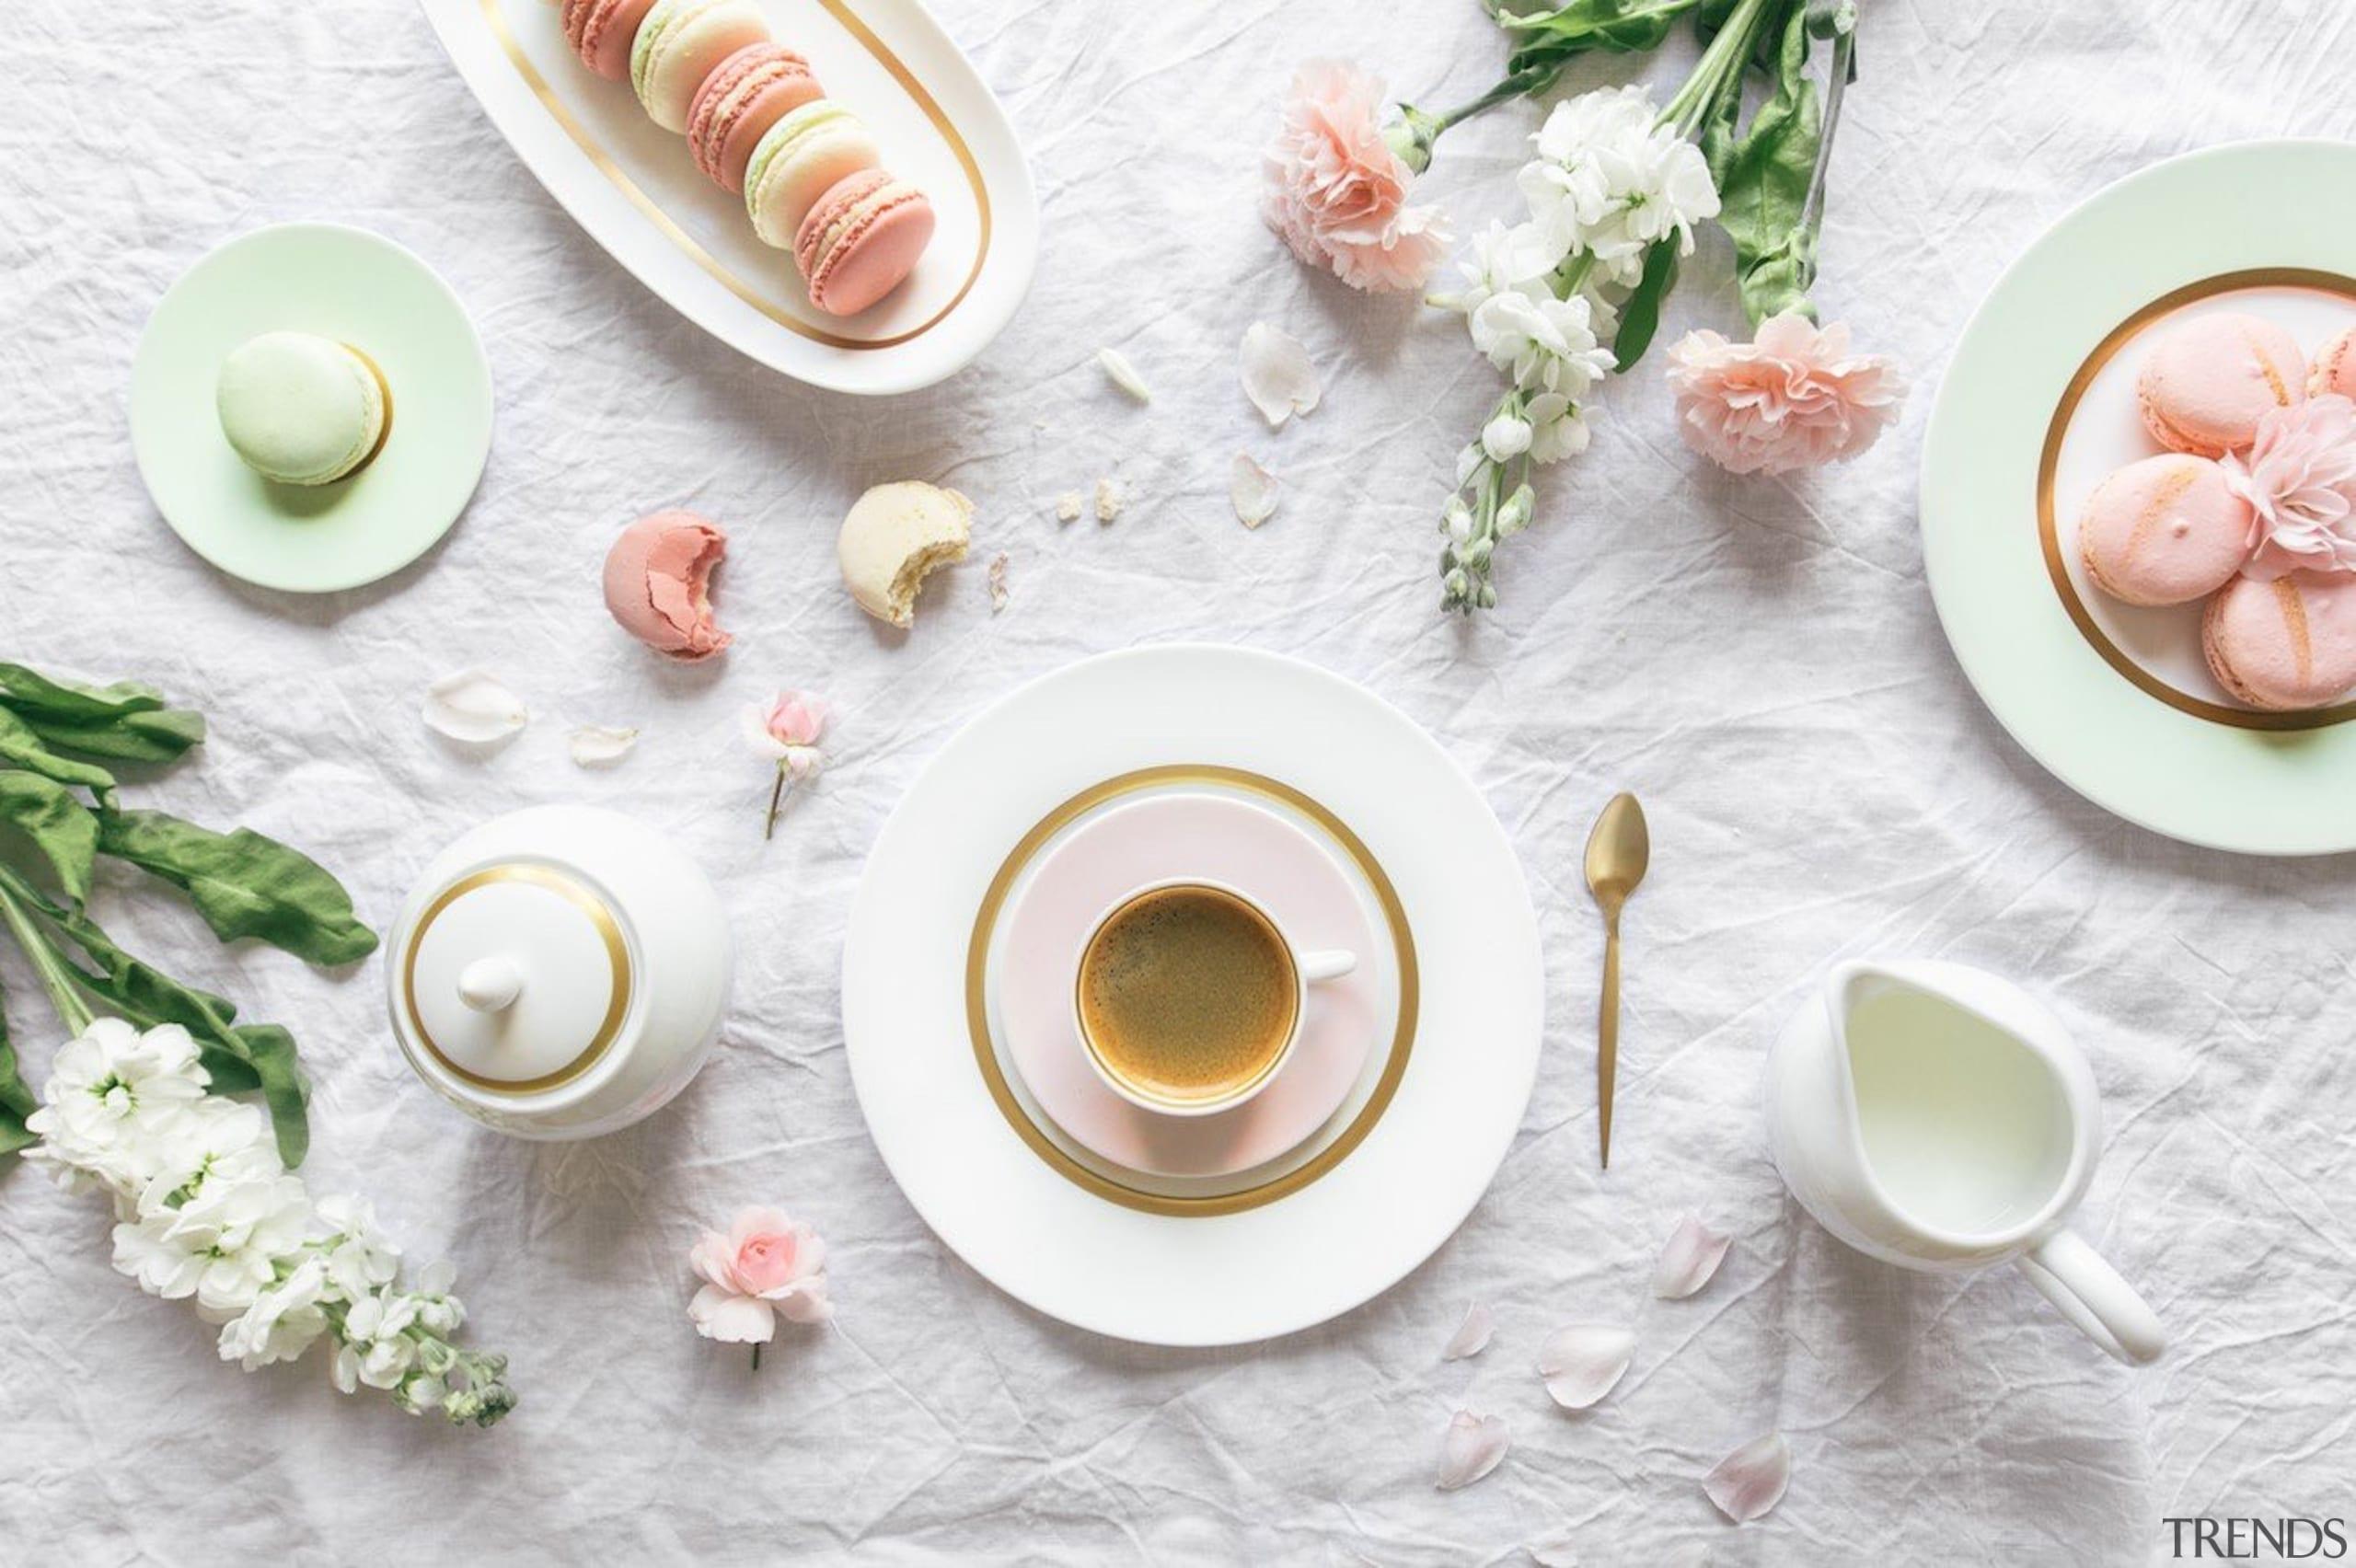 Bernardaud Cronos Collection - Bernardaud Cronos Collection - coffee cup, cup, dish, dishware, plate, porcelain, saucer, serveware, tableware, white